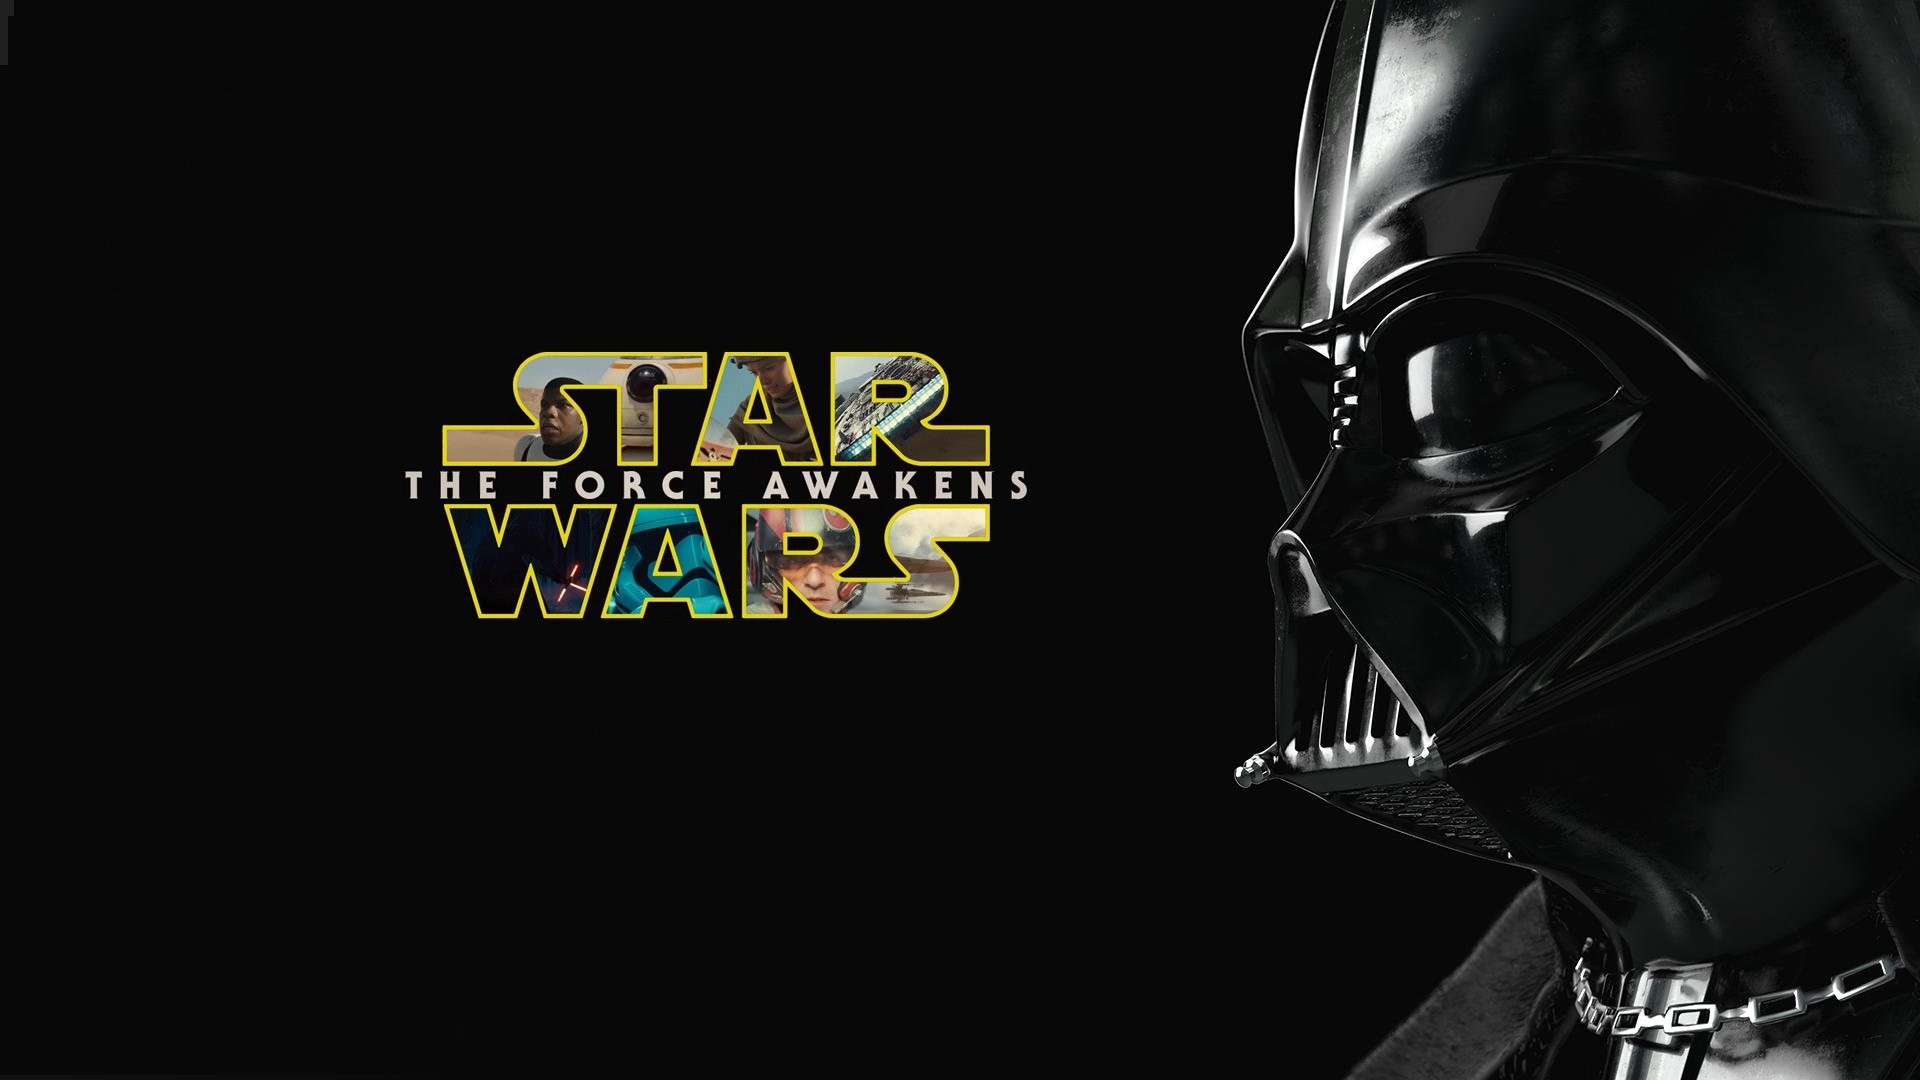 Darth Vader With Star Wars Force Awakens Wallpaper Darth Vader 1920x1080 Wallpaper Teahub Io